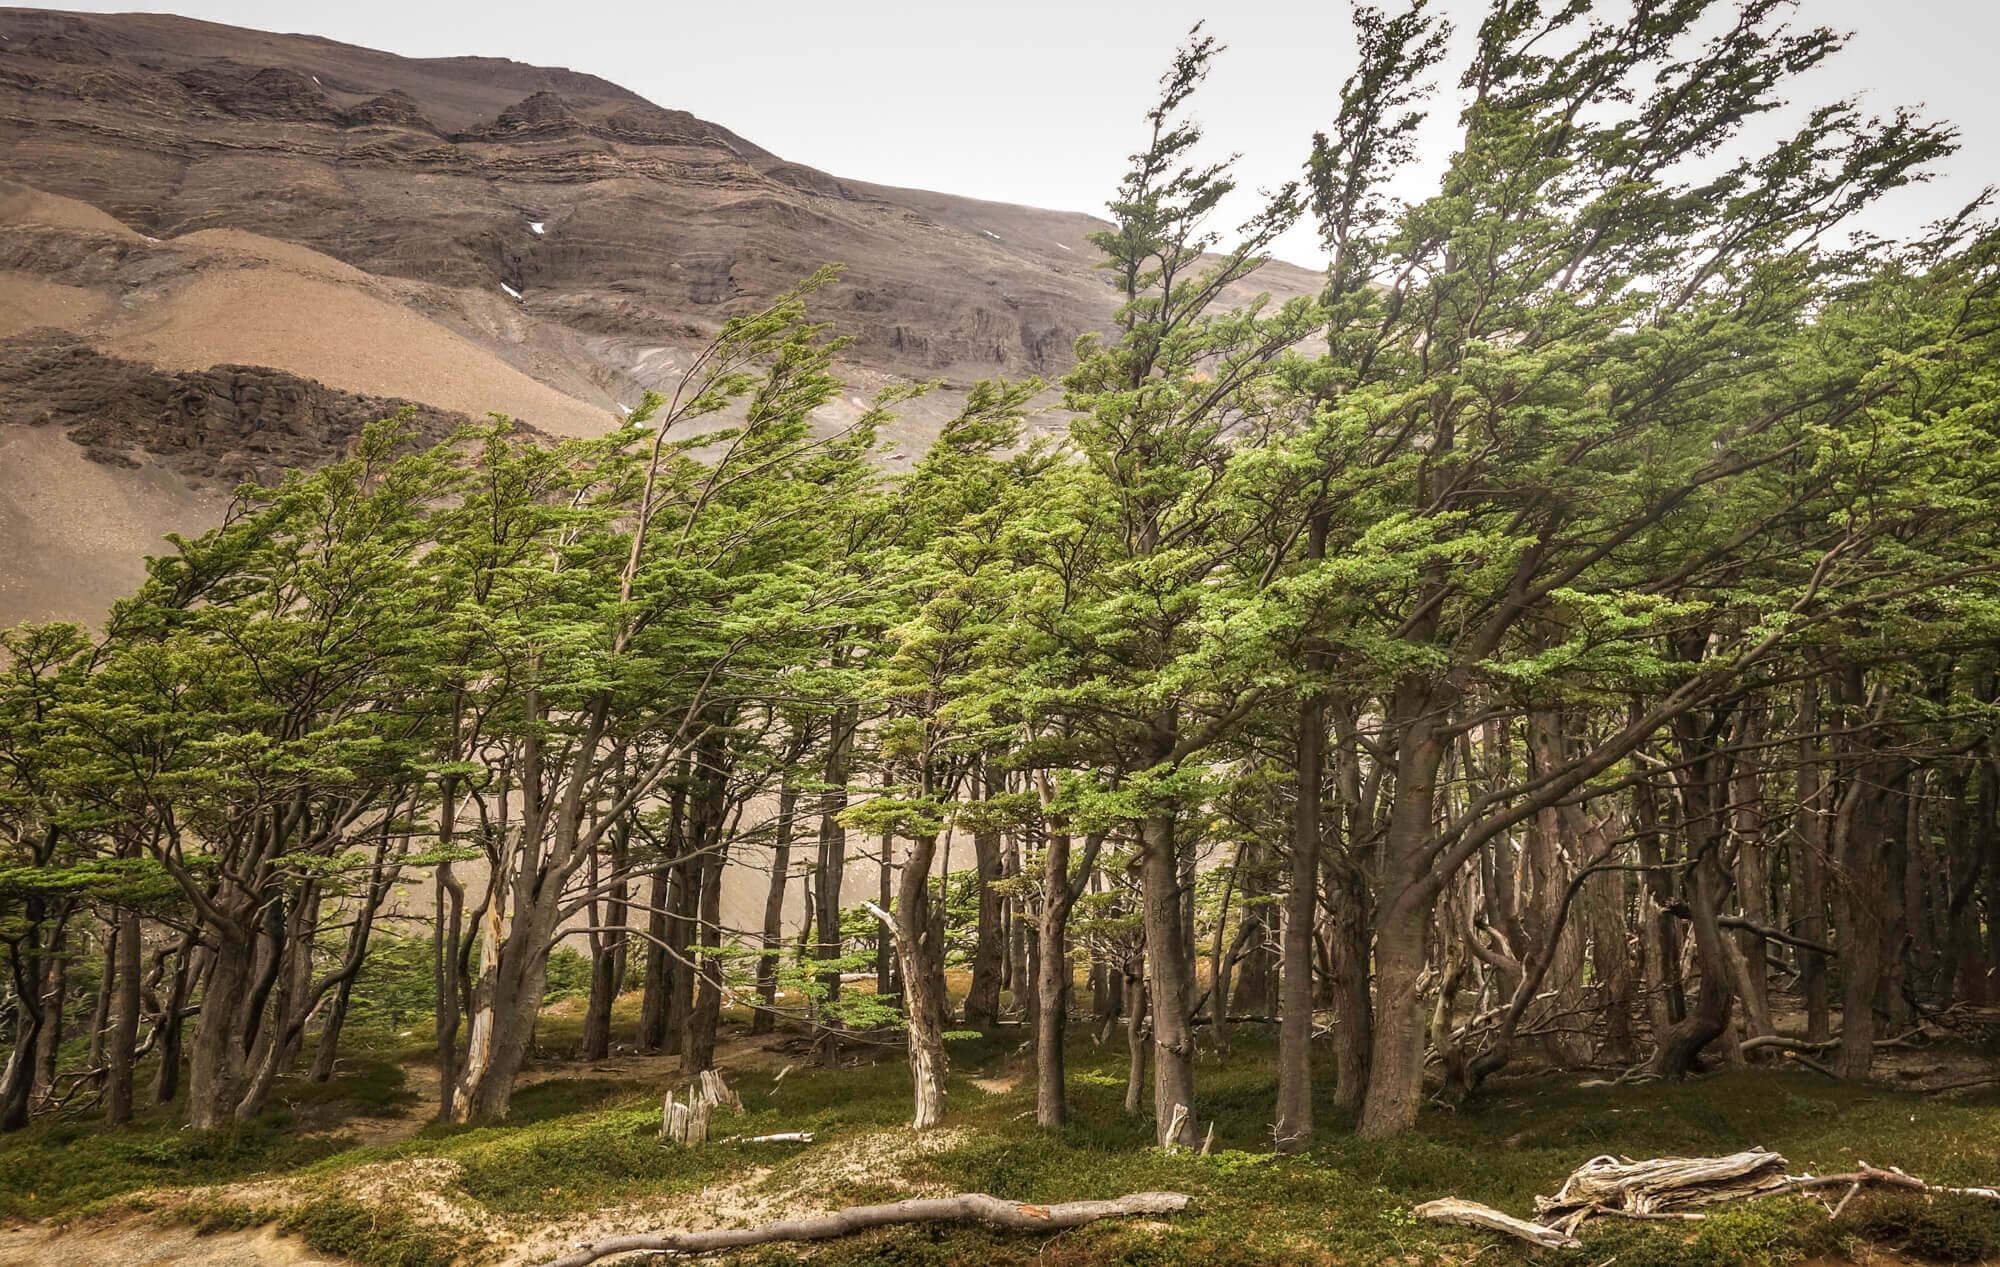 Lena trees Torres del Paine